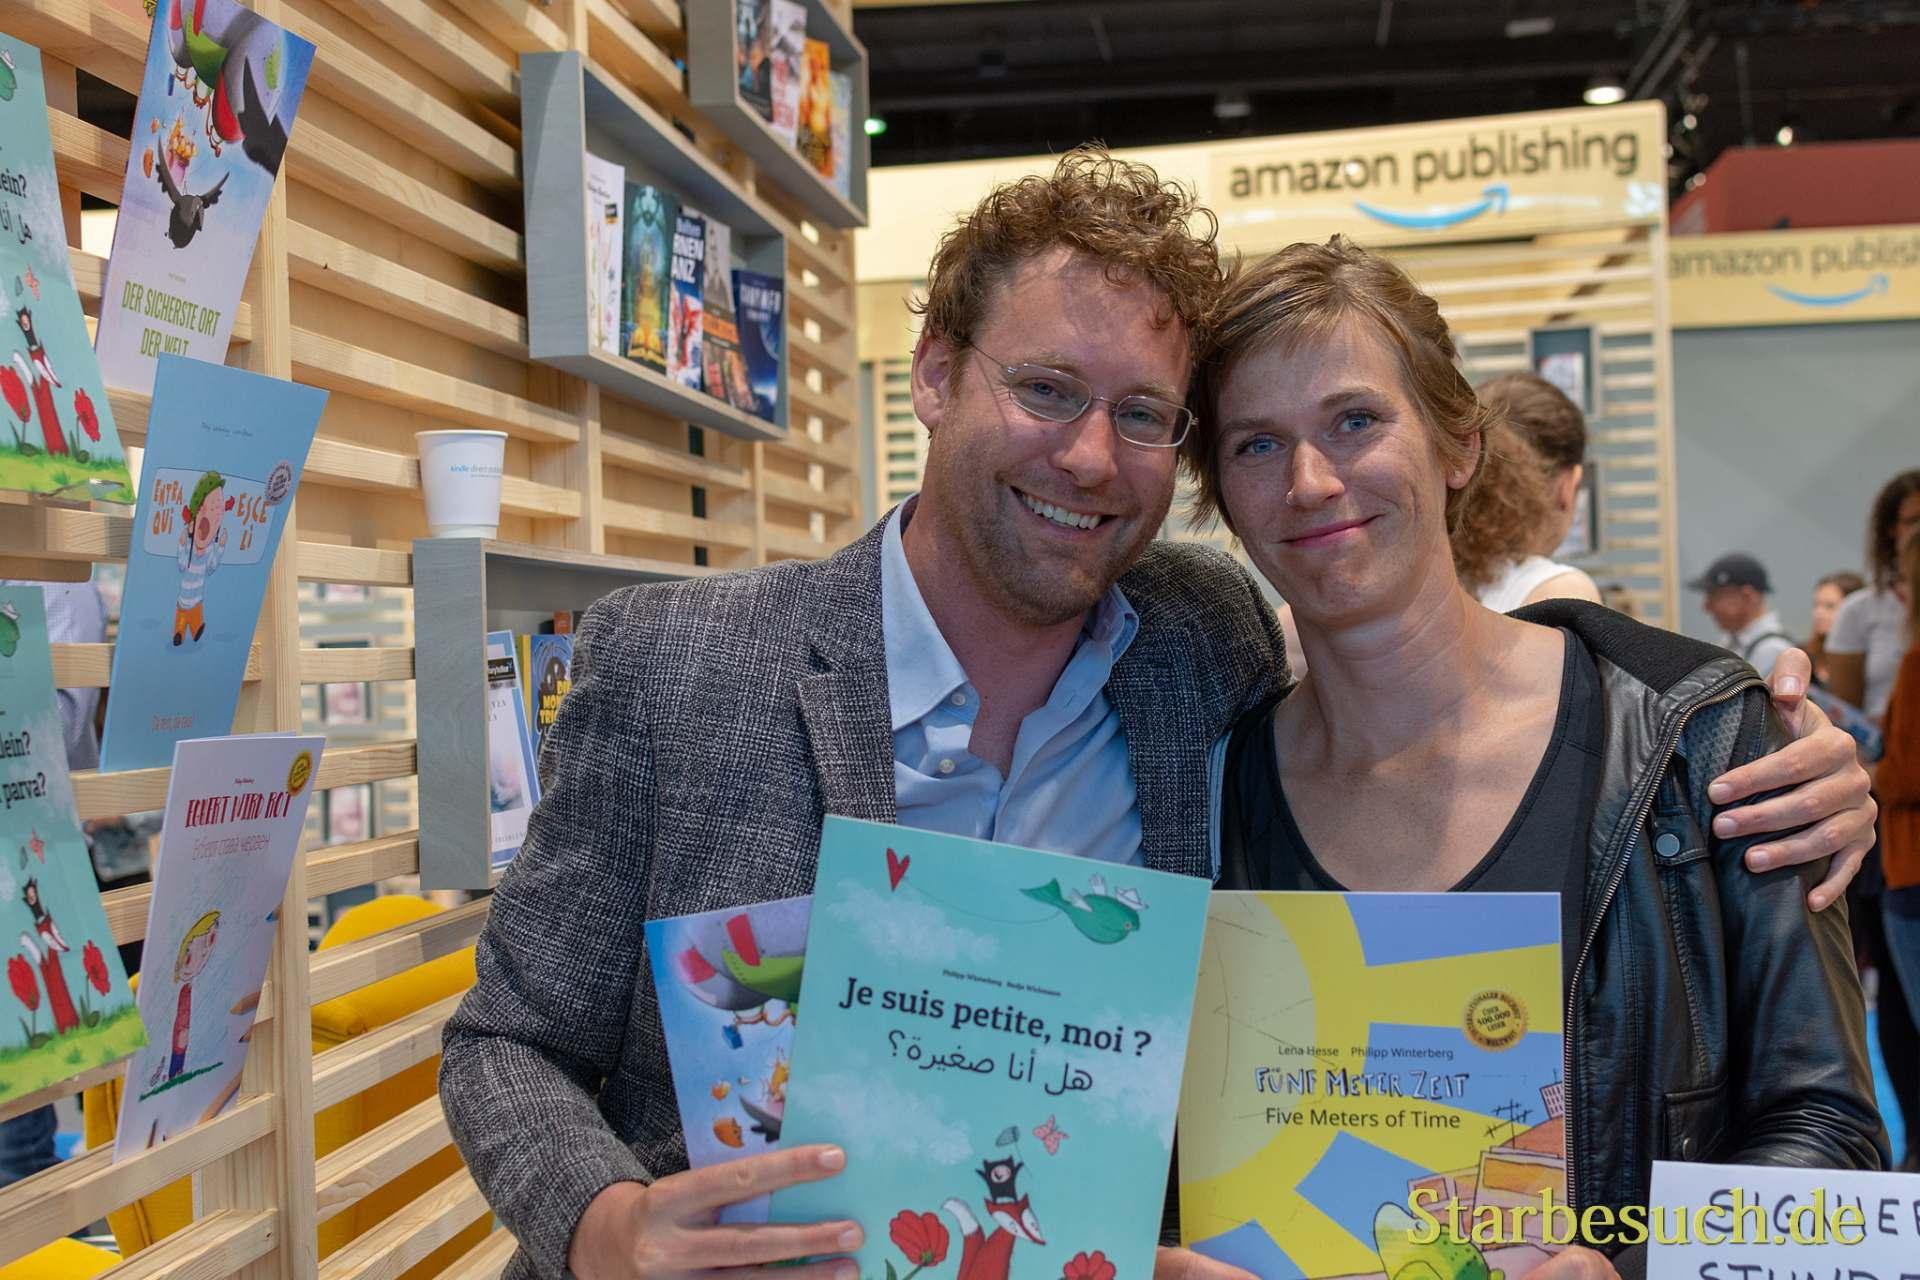 Autor Philipp Winterberg und Illustratorin Lena Hesse